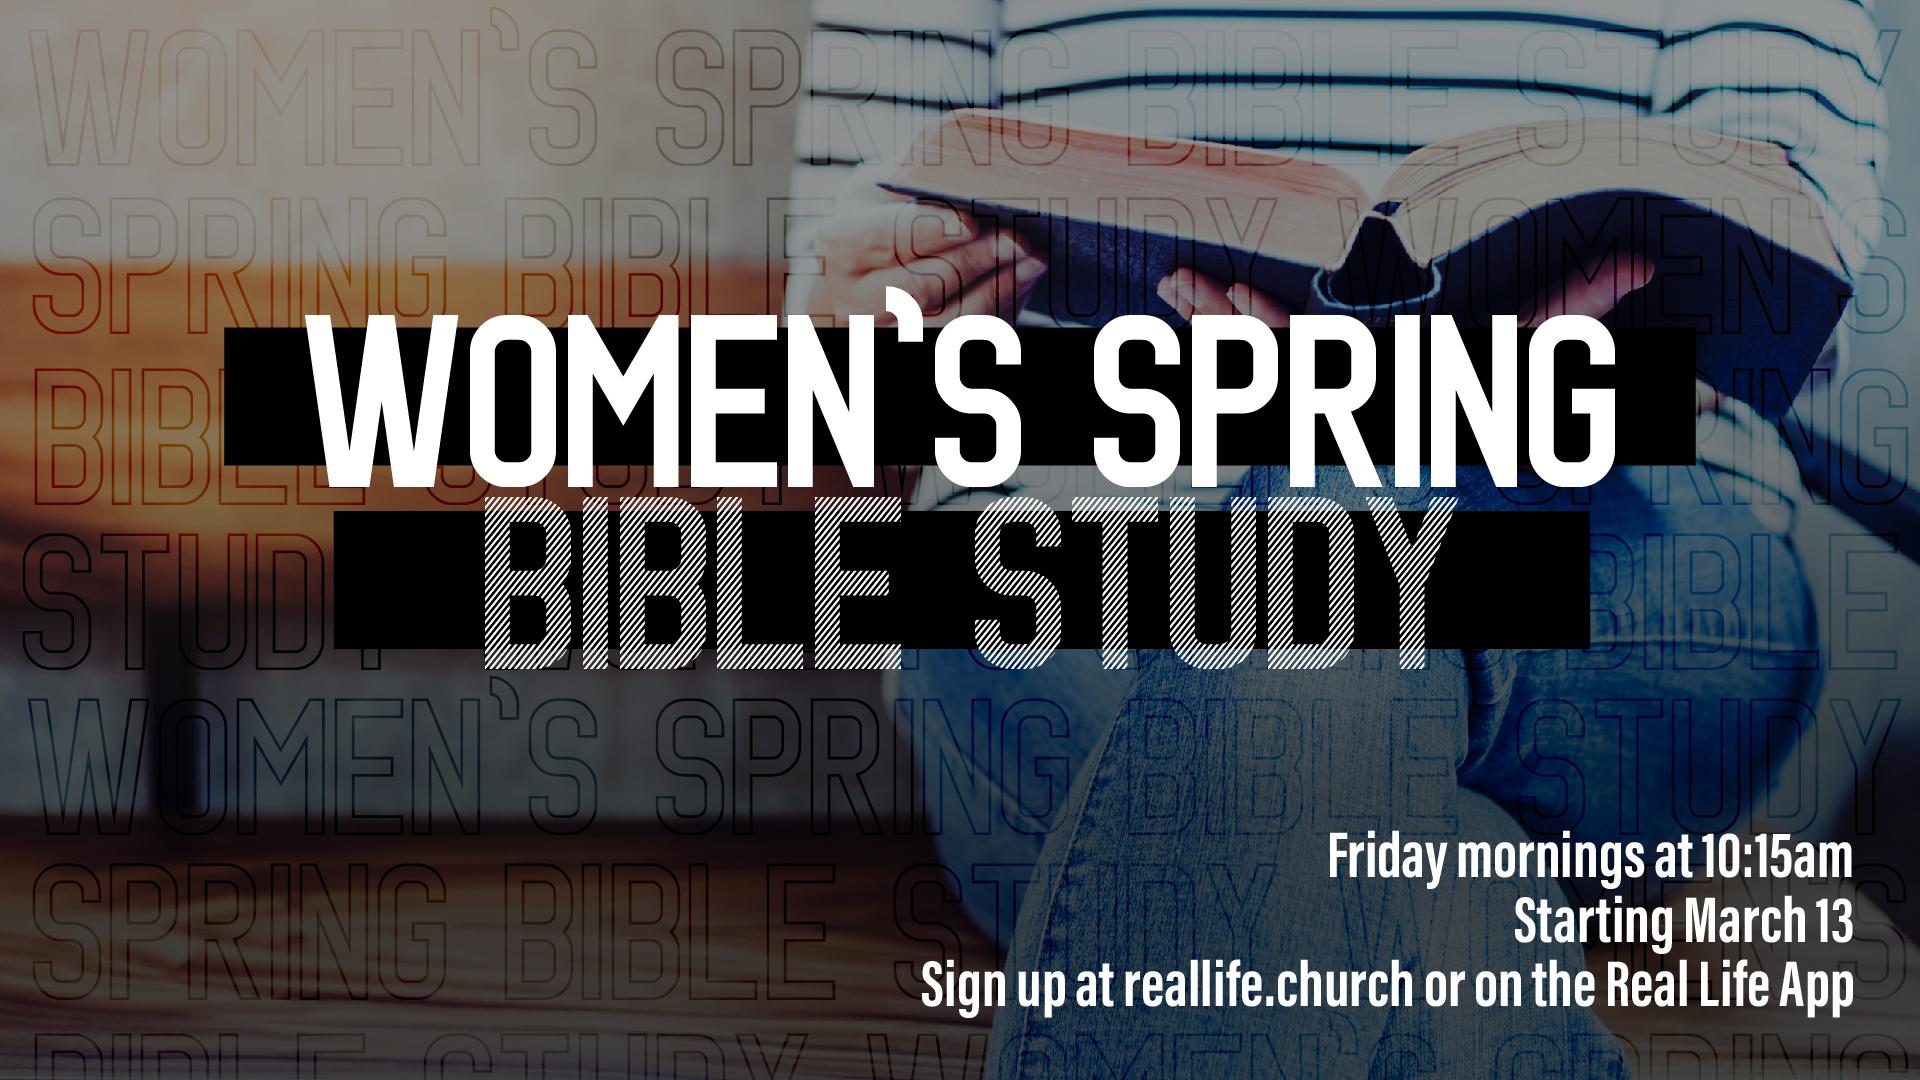 Women's Spring Bible Study - Fridays